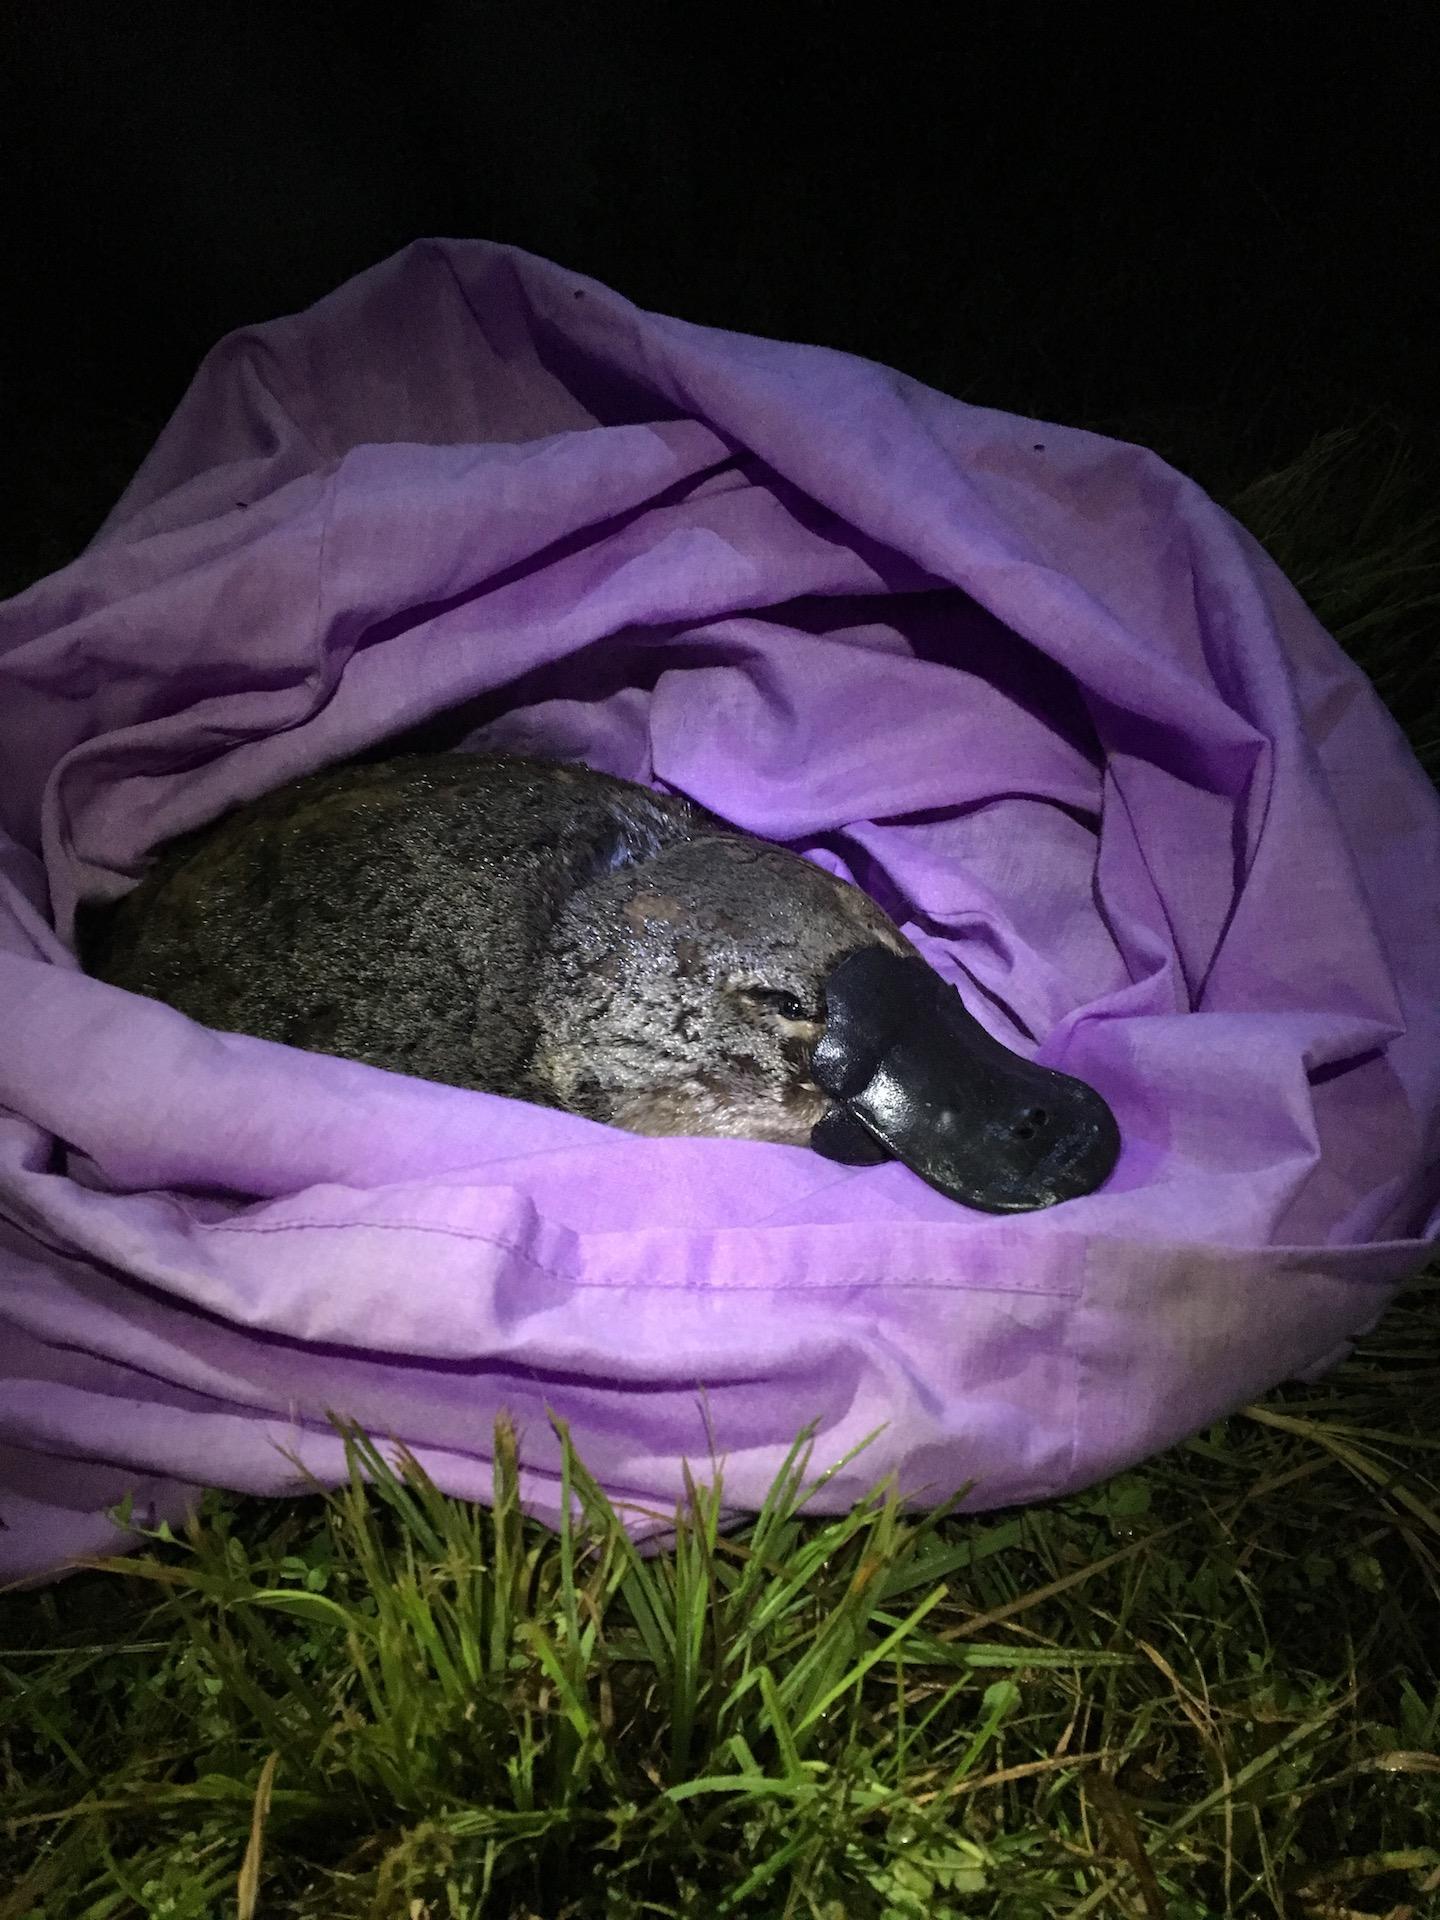 Platypus on Brink of Extinction (2 of 3)